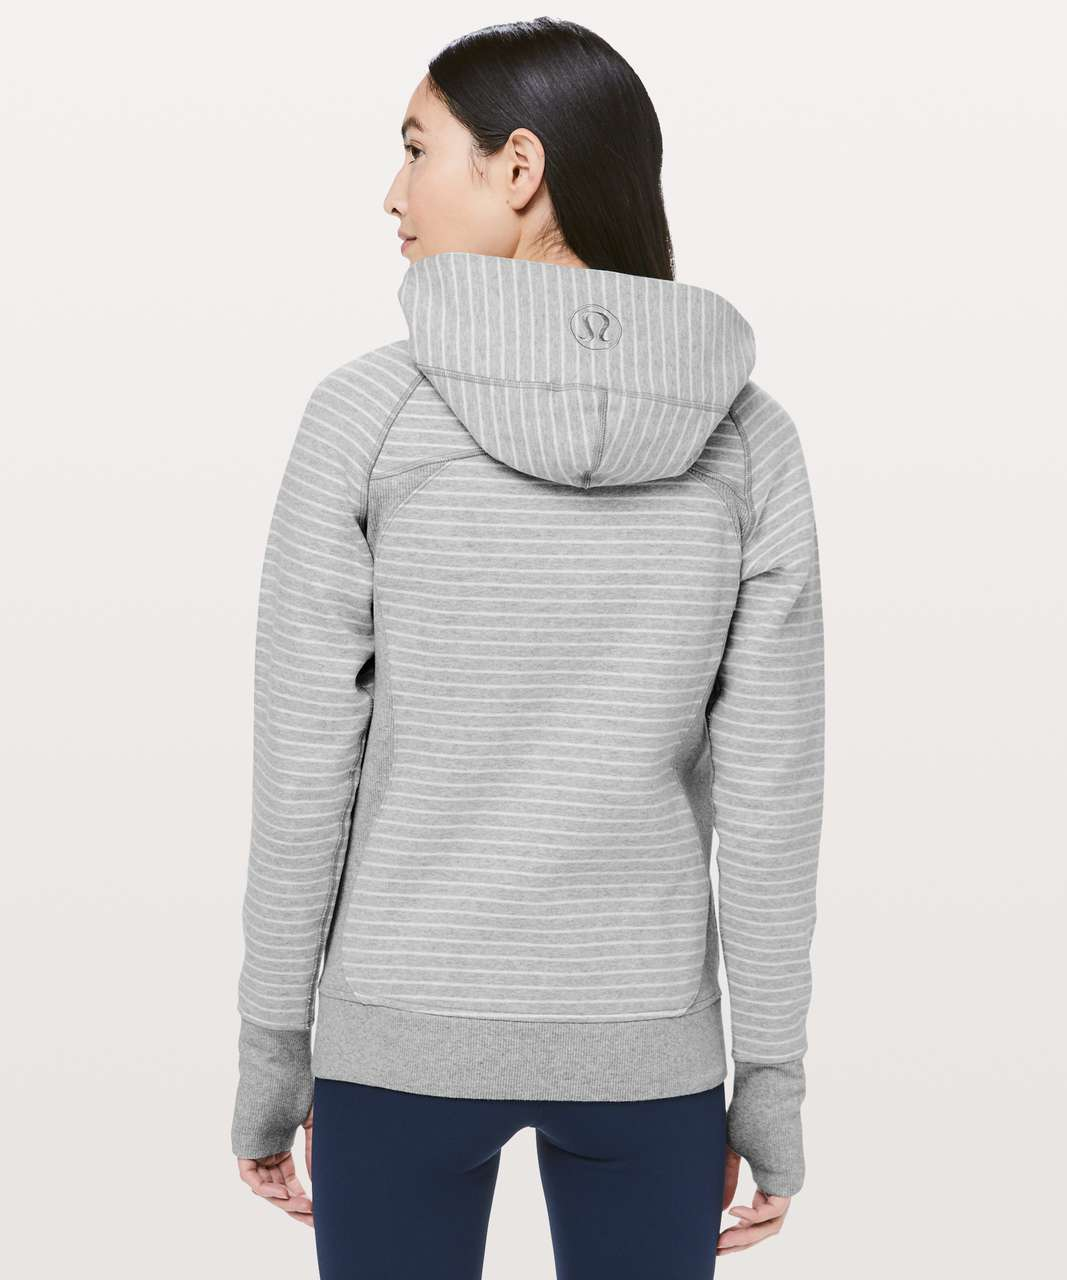 Lululemon Scuba Hoodie *Classic Cotton Fleece - Parallel Stripe Heathered Core Light Grey Heathered White